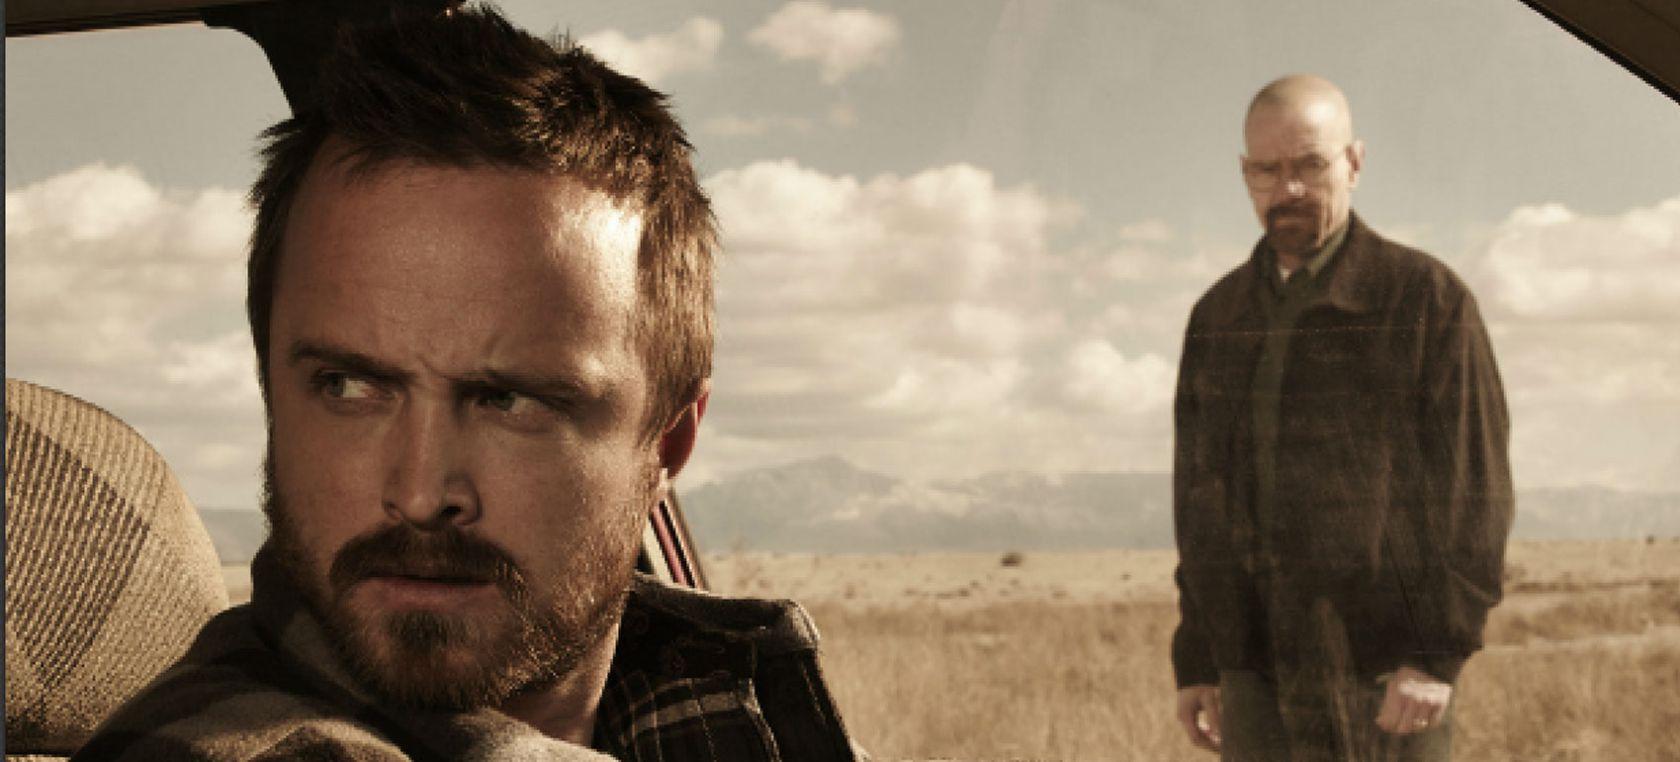 El Camino: A Breaking Bad Movie revela espectacular primer tráiler oficial